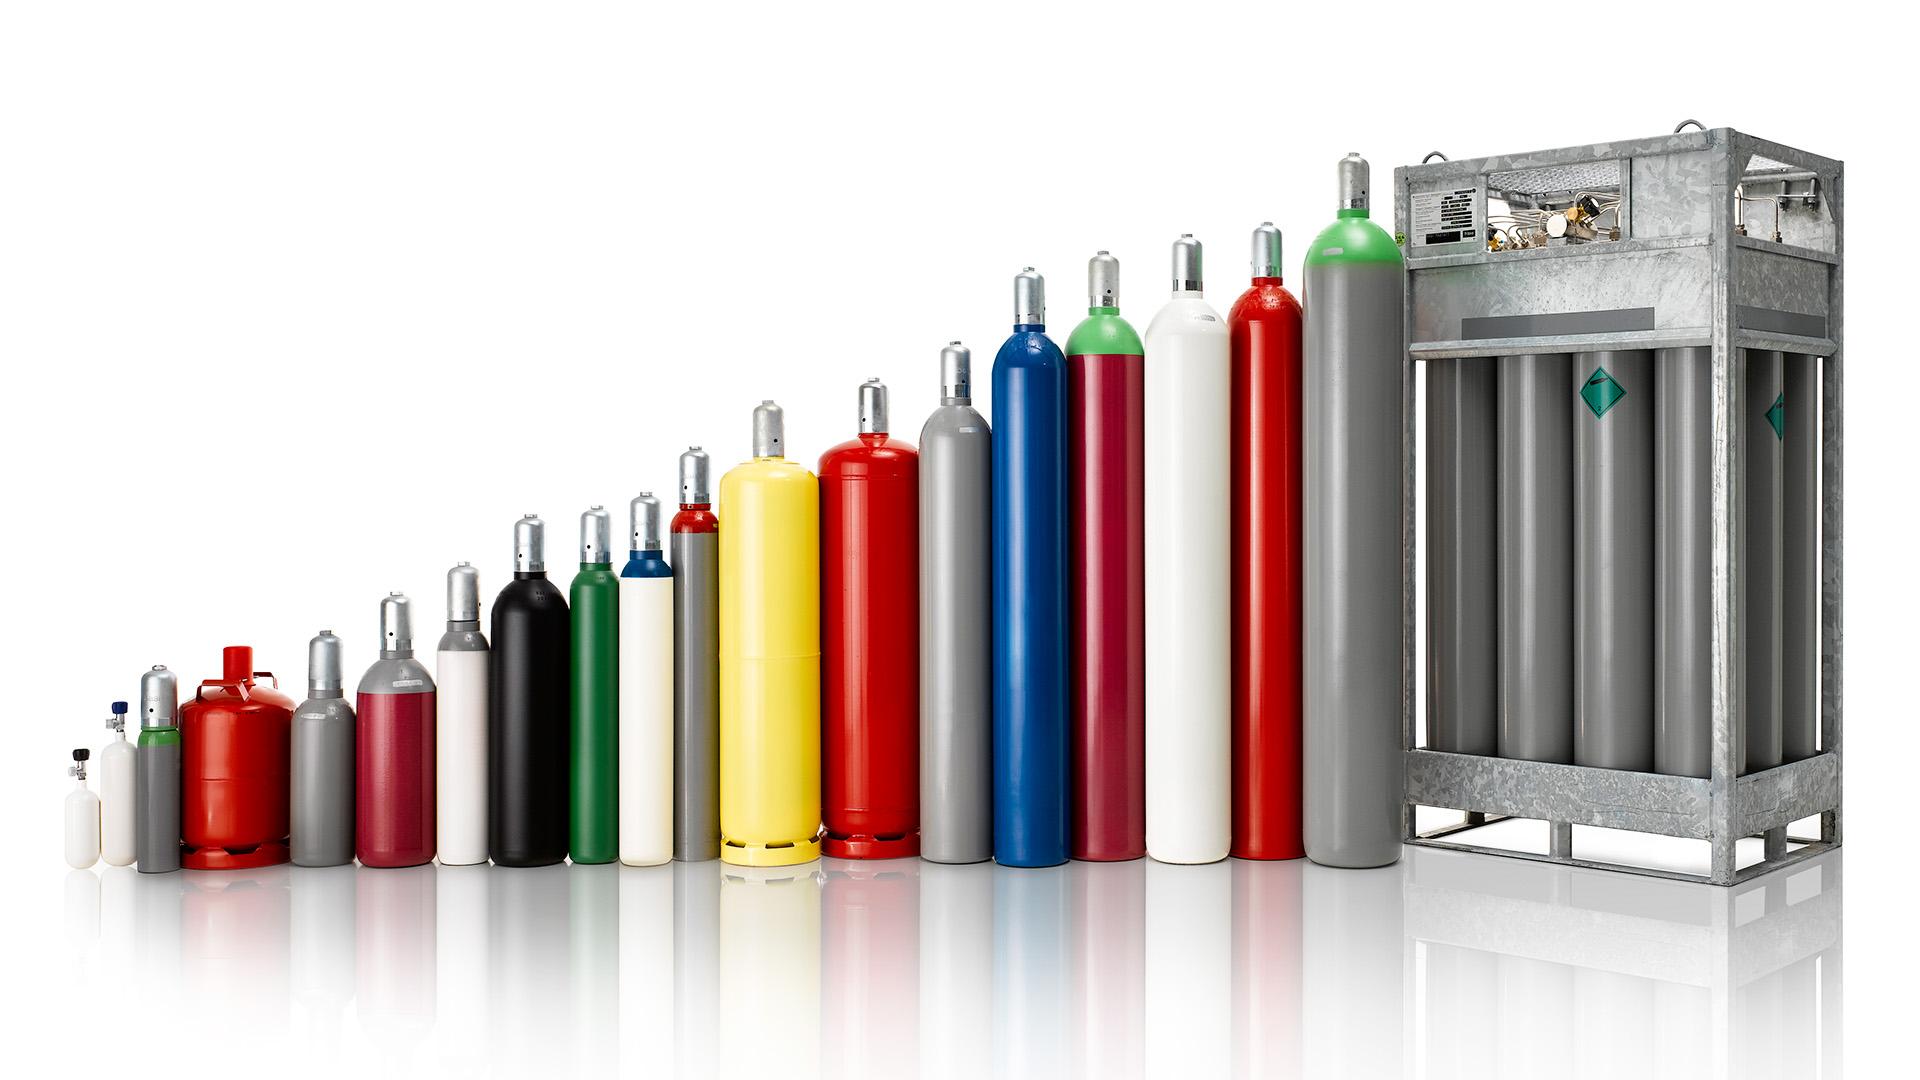 basi Schöberl GmbH & Co. KG Impression